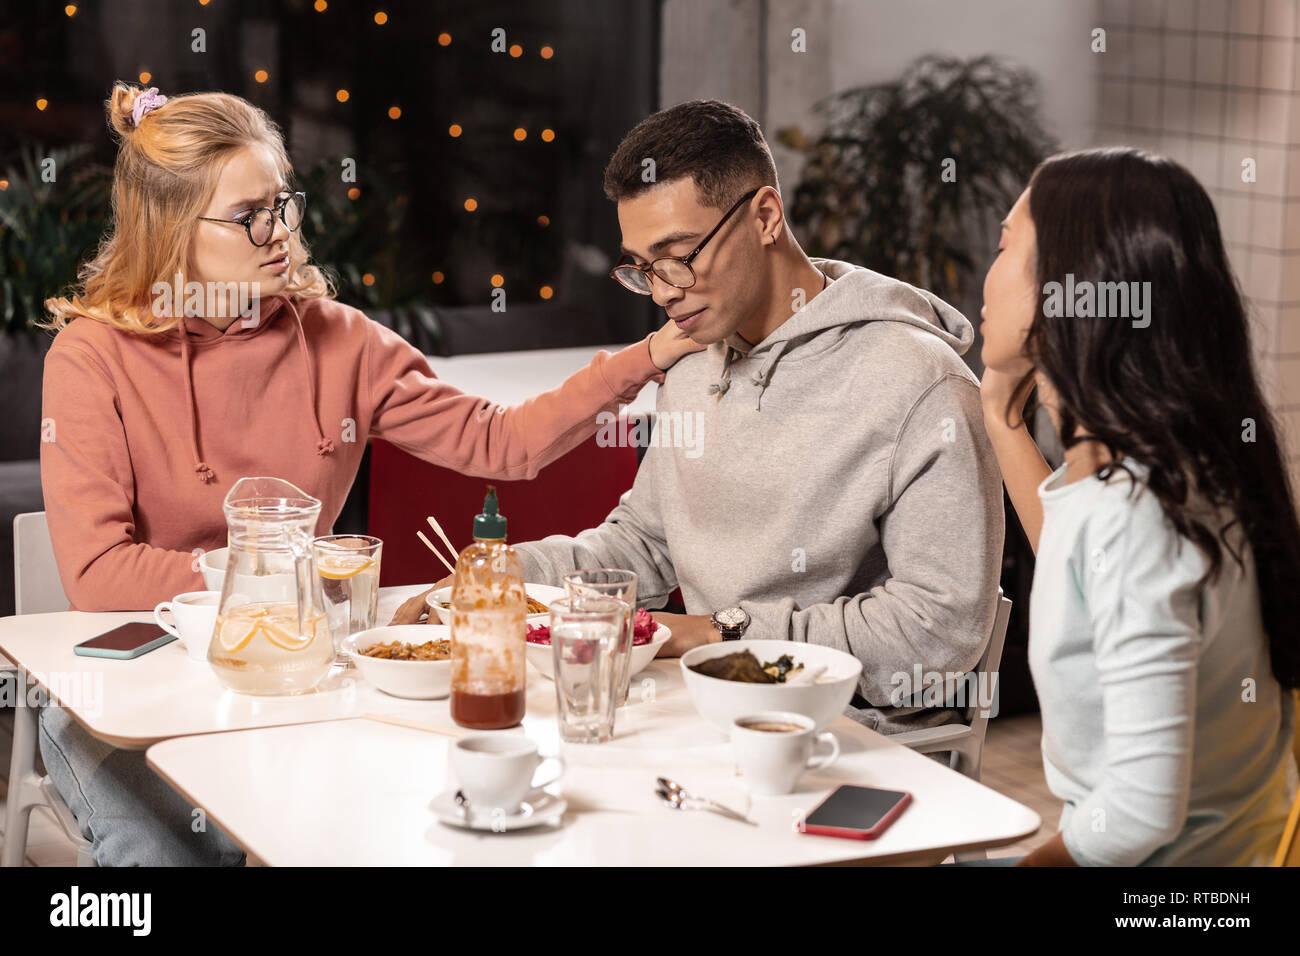 Adorables chicas intentando consolar a Guy haciendo fotos con él. Imagen De Stock